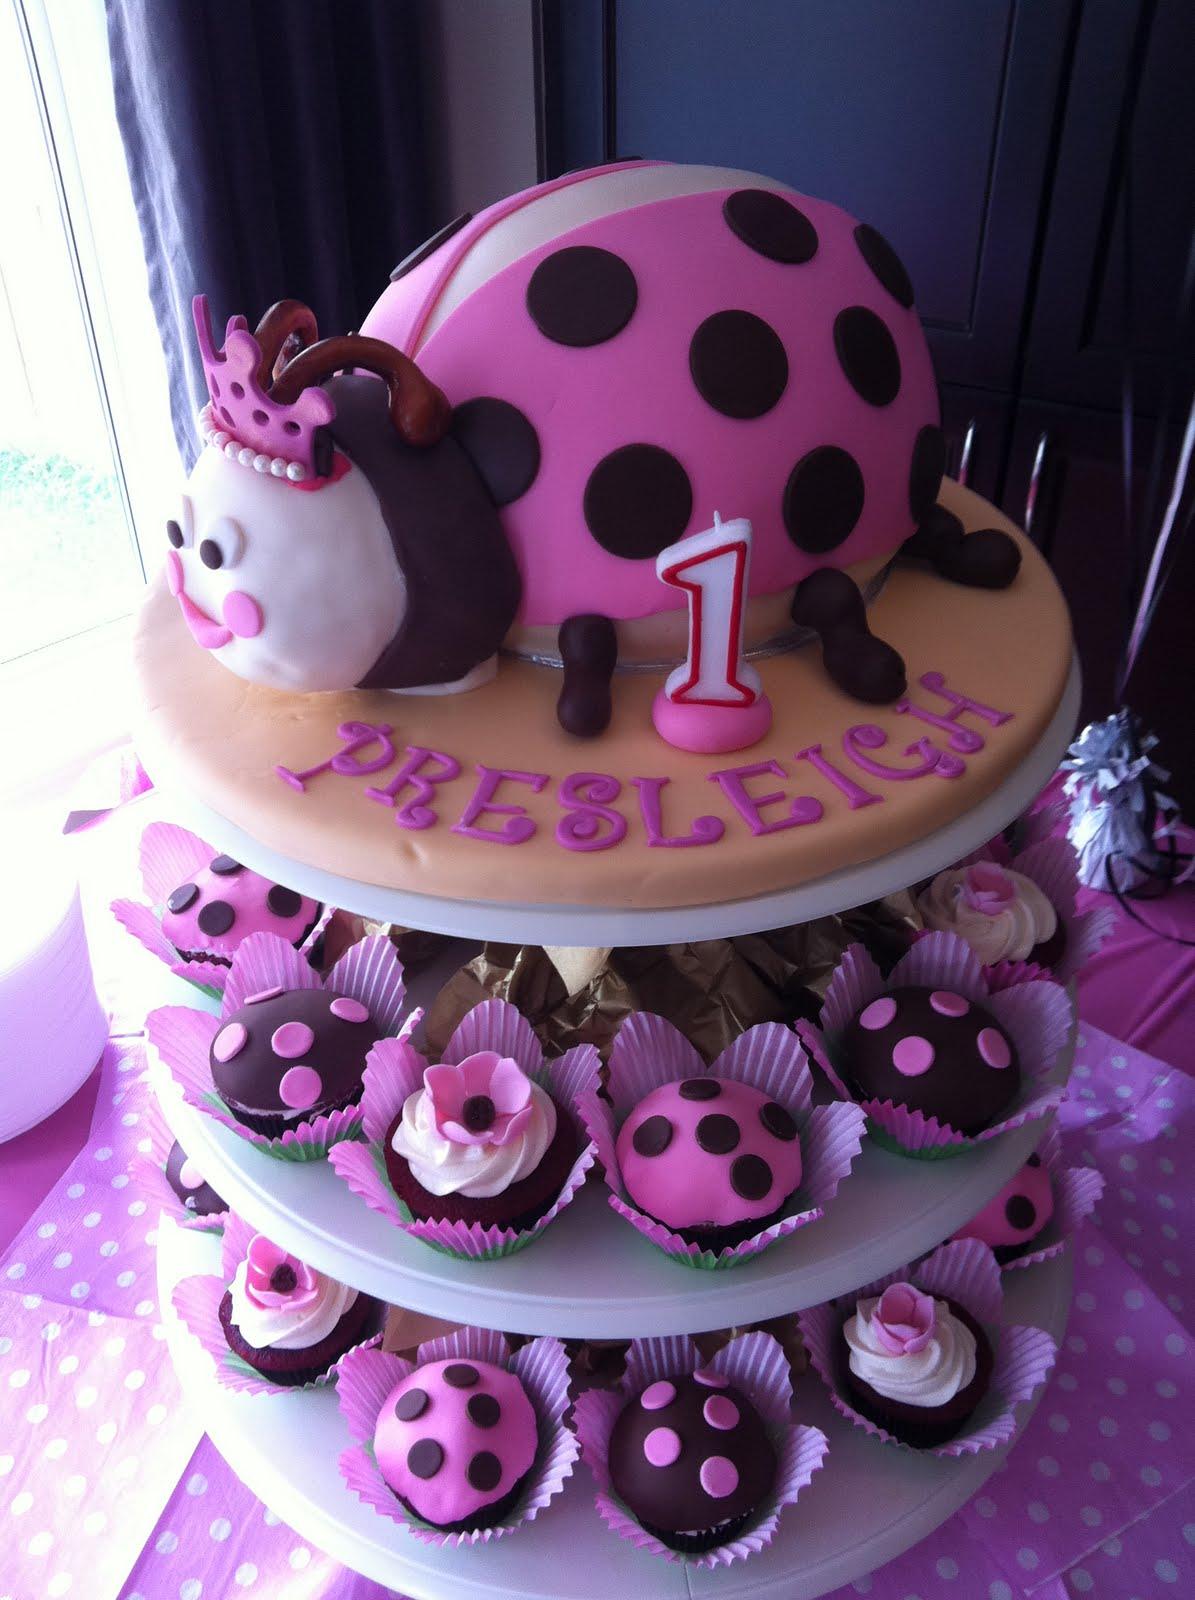 Jocelyn S Wedding Cakes And More Ladybug Cupcakes